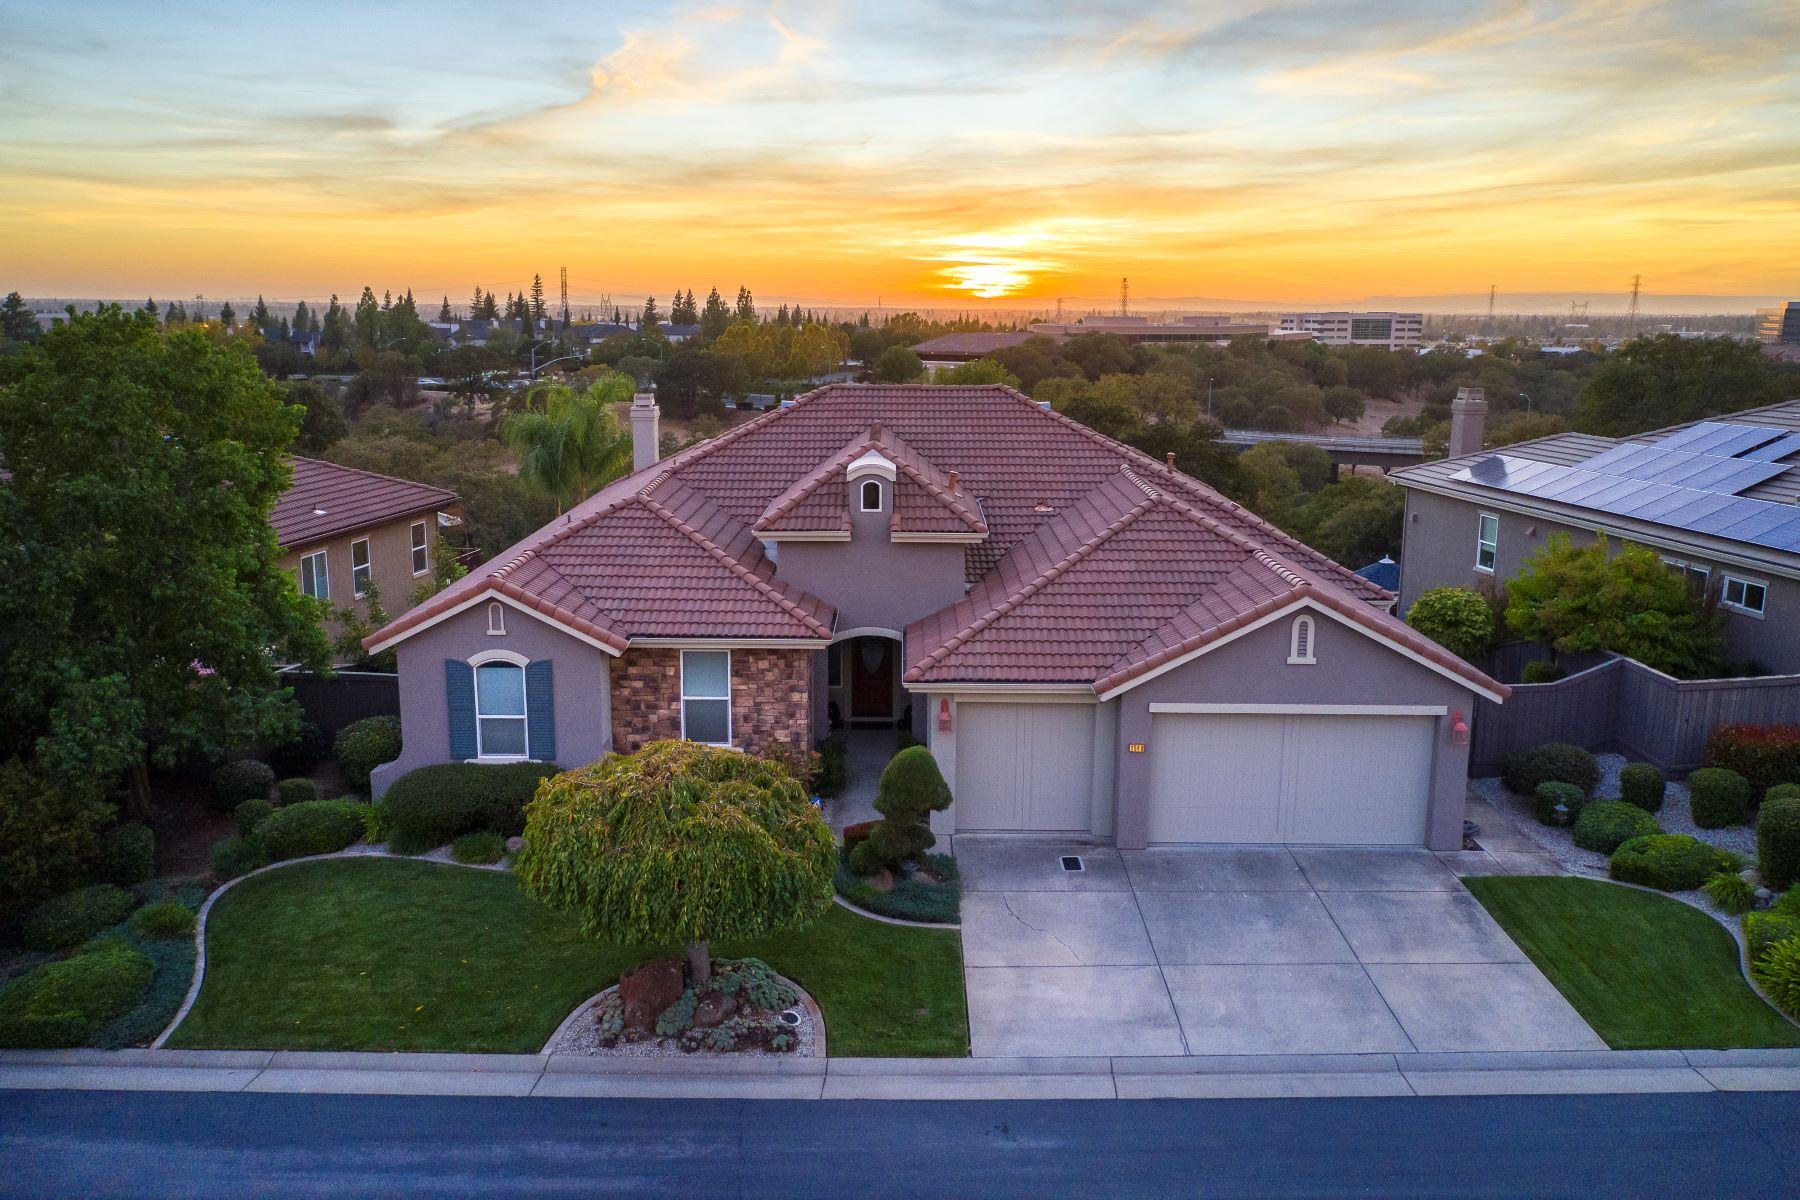 Single Family Homes 为 销售 在 1548 Vista Ridge Way, Roseville, CA 95661 1548 Vista Ridge Way Roseville, 加利福尼亚州 95661 美国